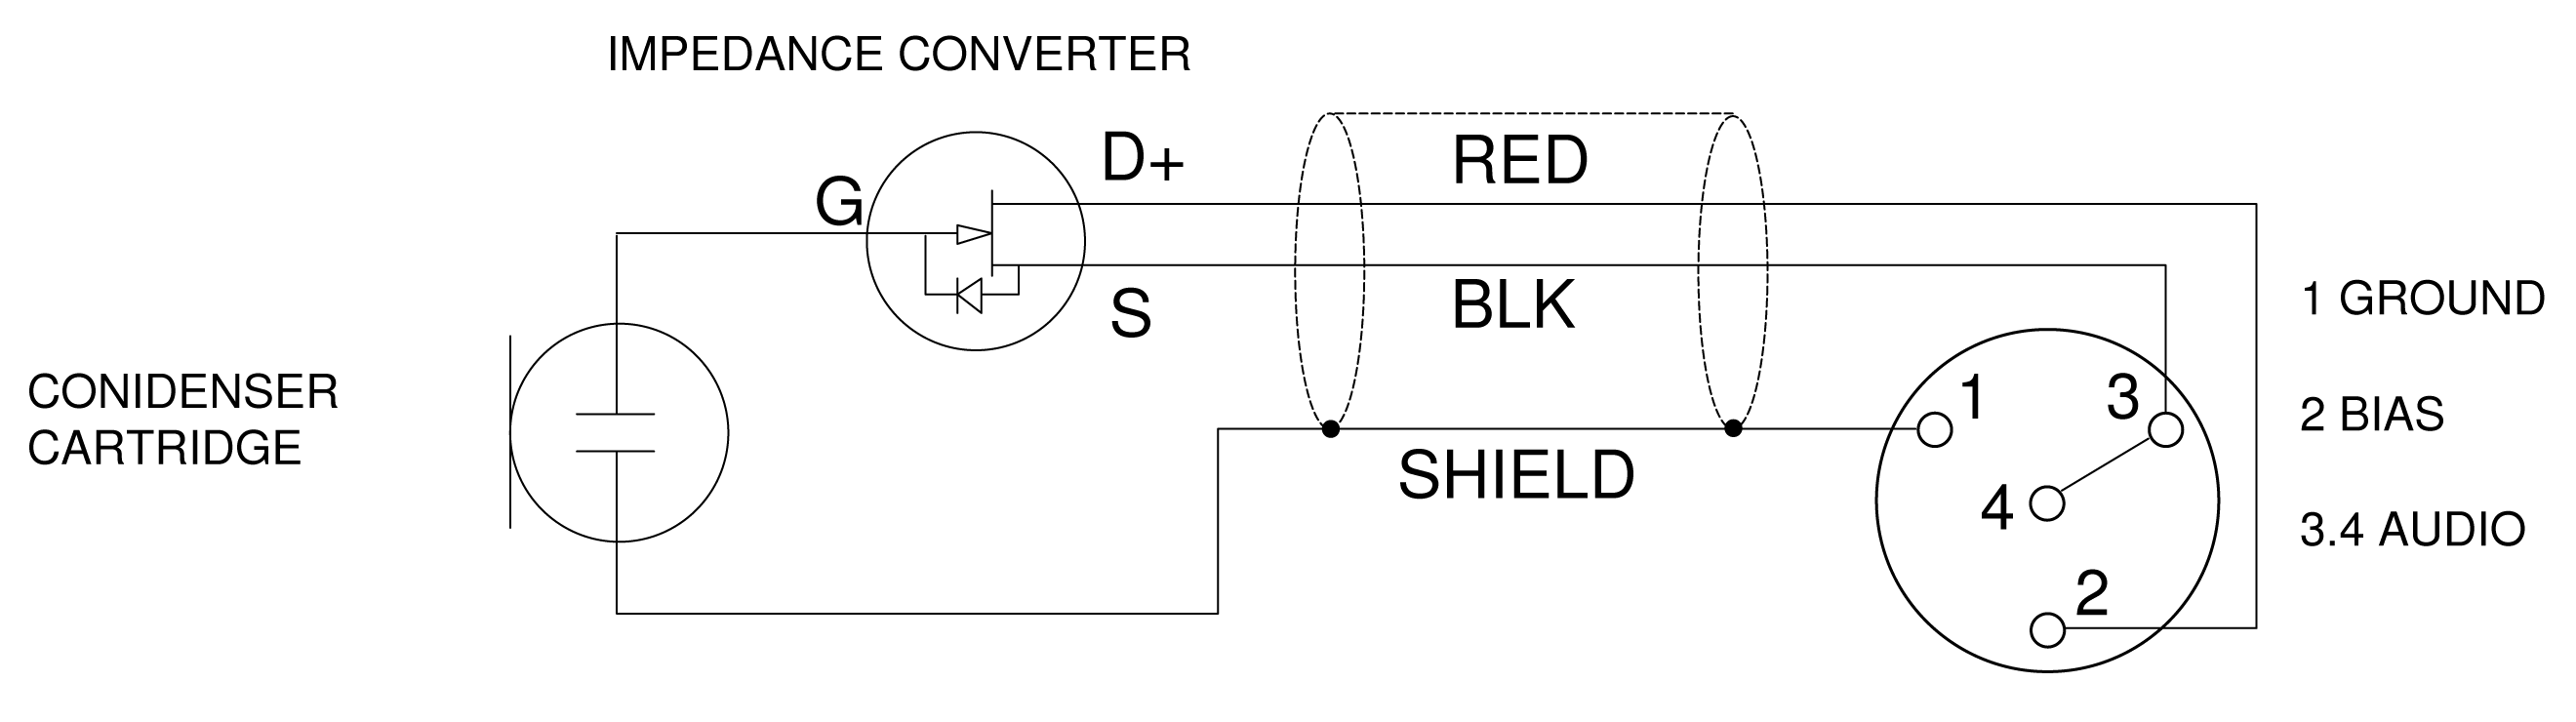 Shure Microphone Wiring Diagram